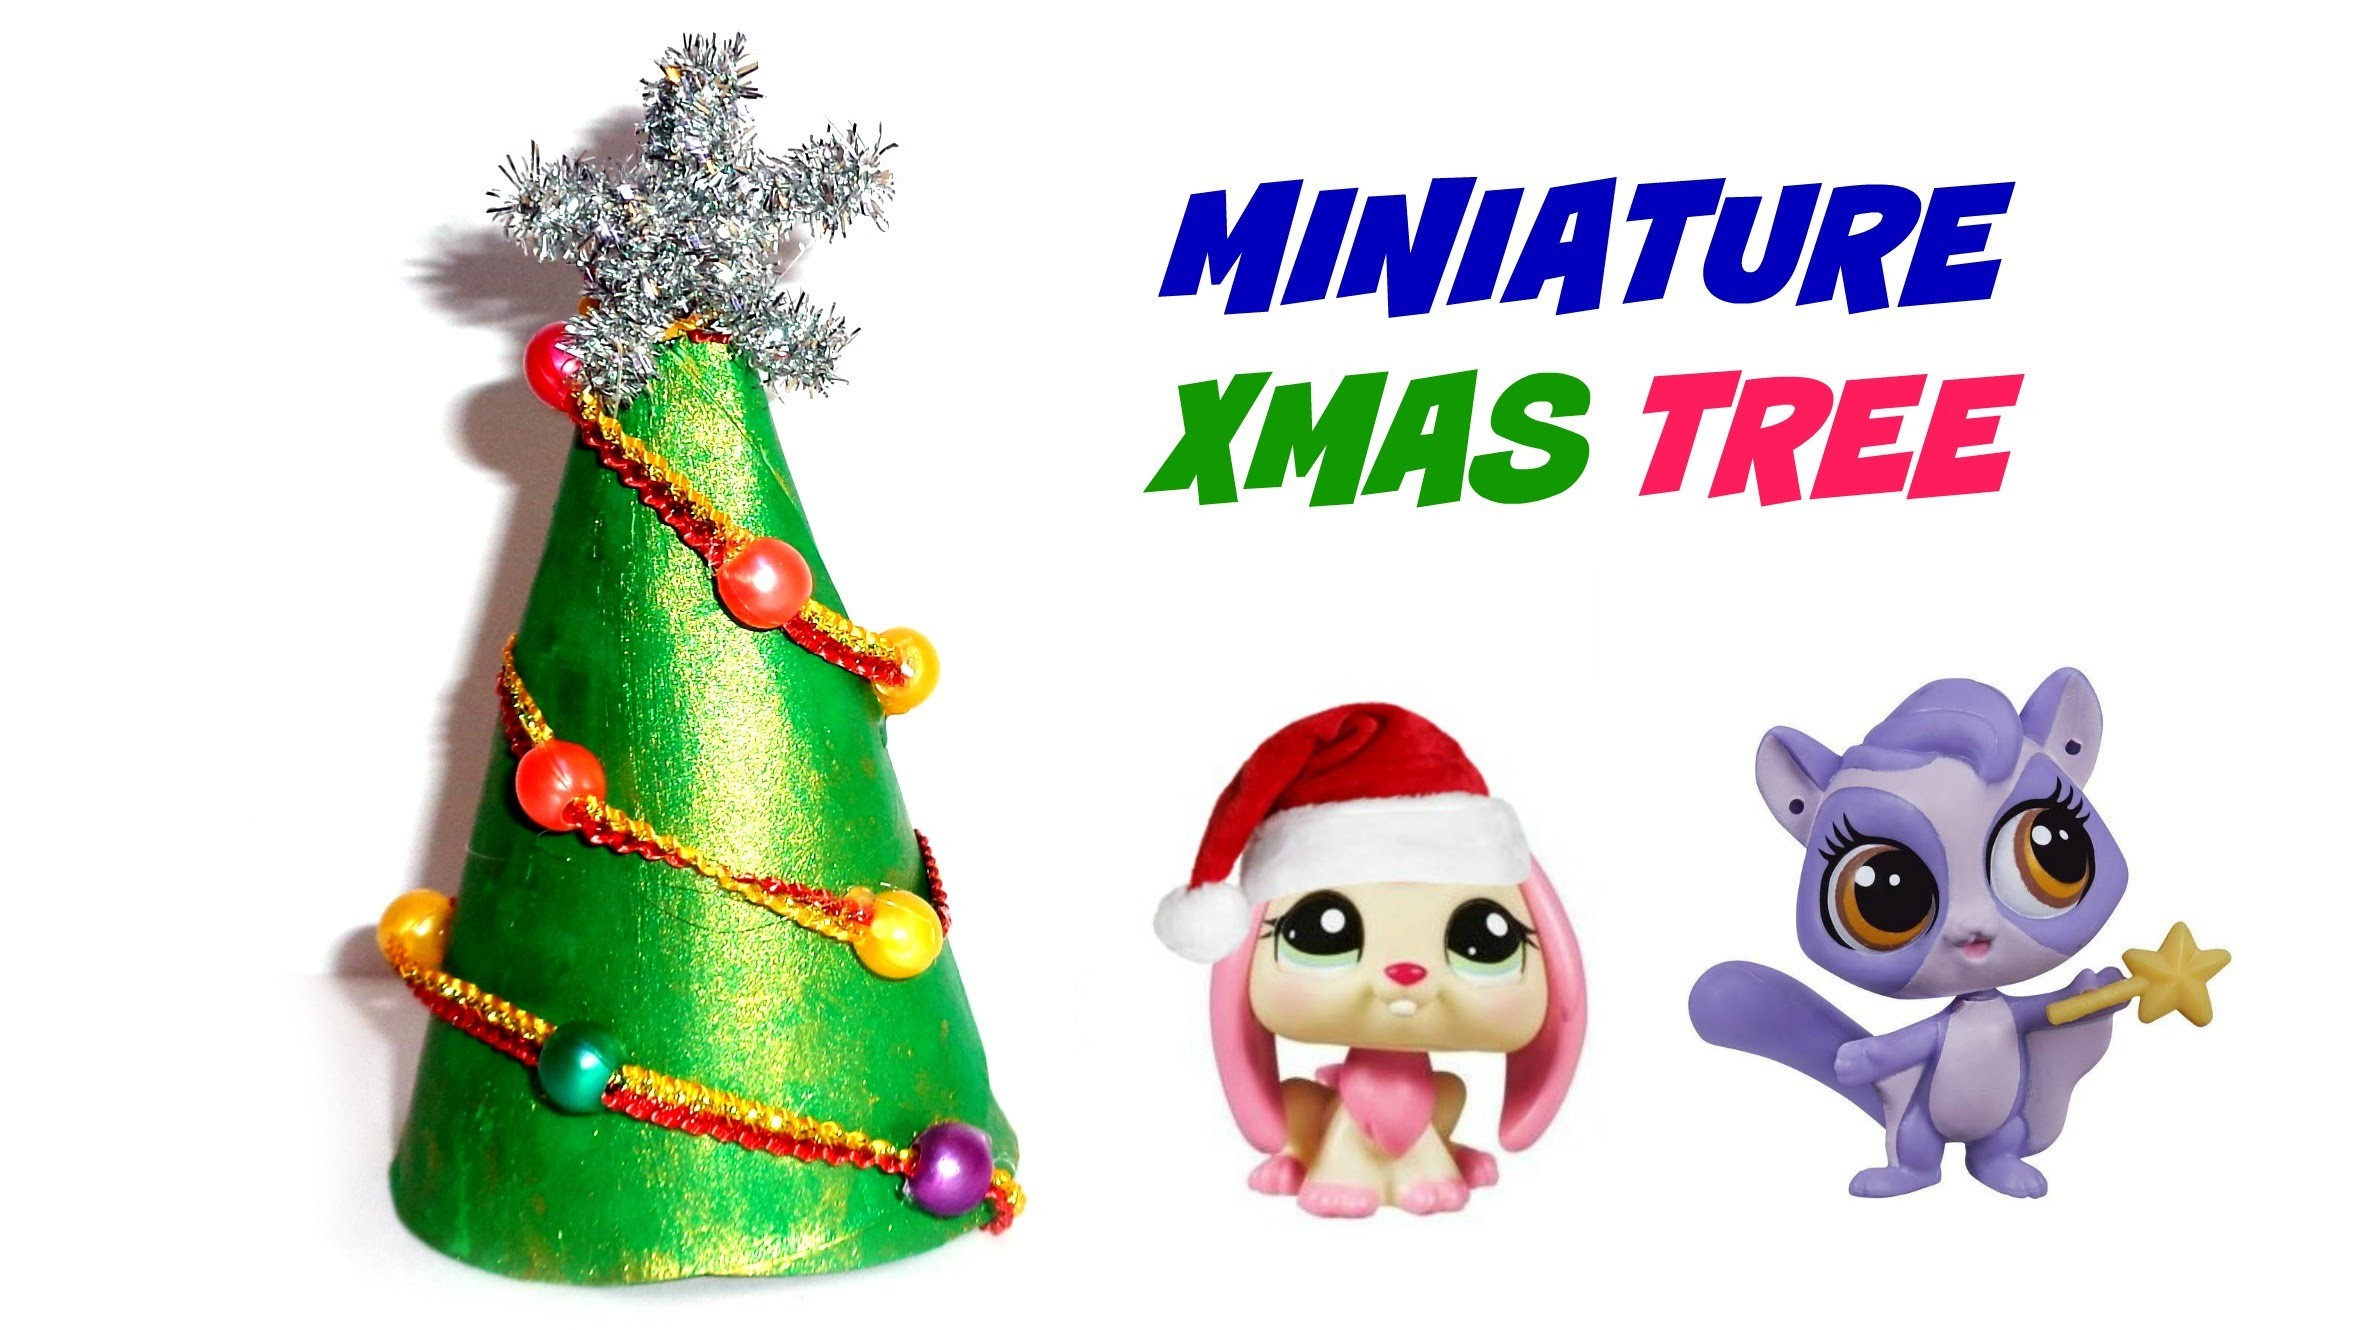 Miniature Dollhouse Christmas Tree - DIY LPS Stuff, Crafts & Accessories